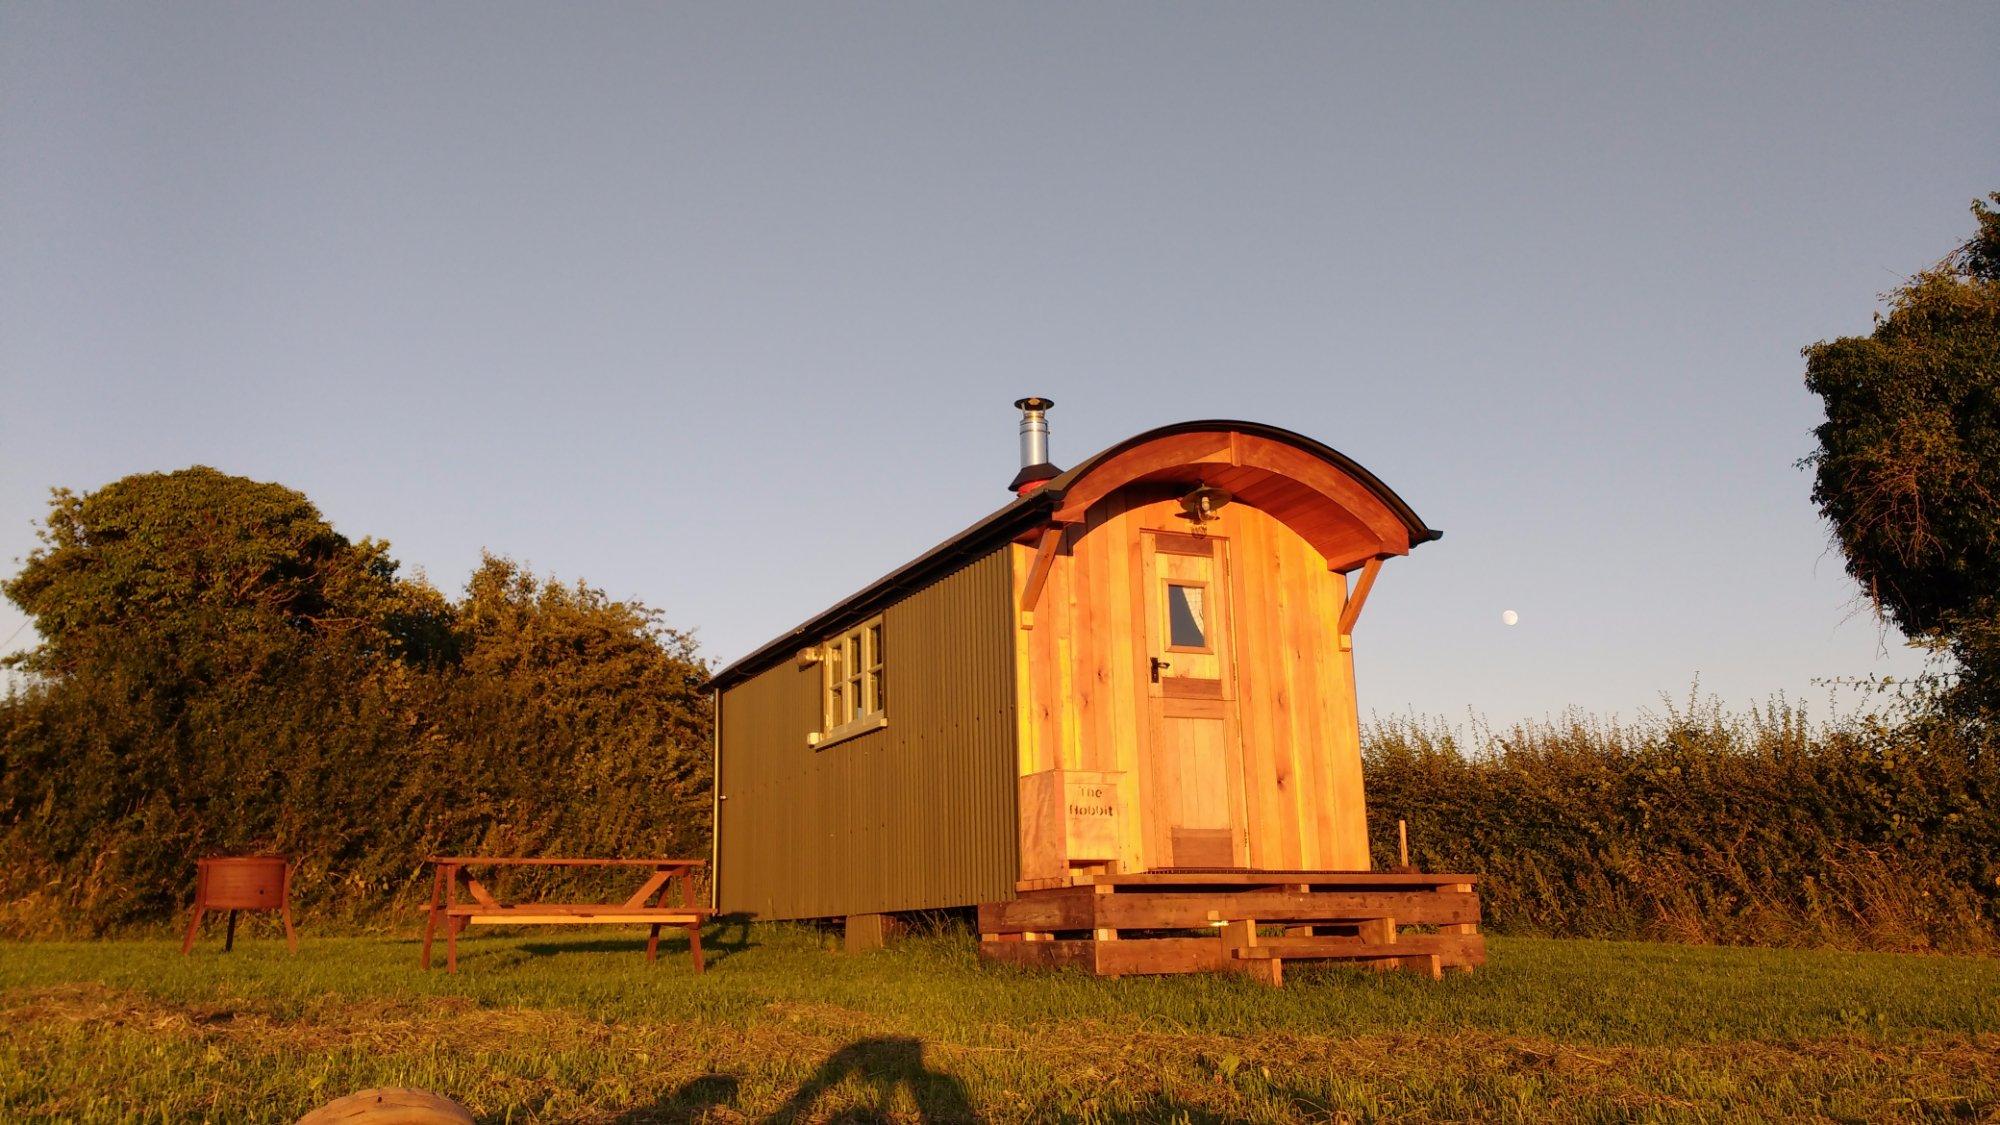 Walnut Tree Farm Camping & Bunk House